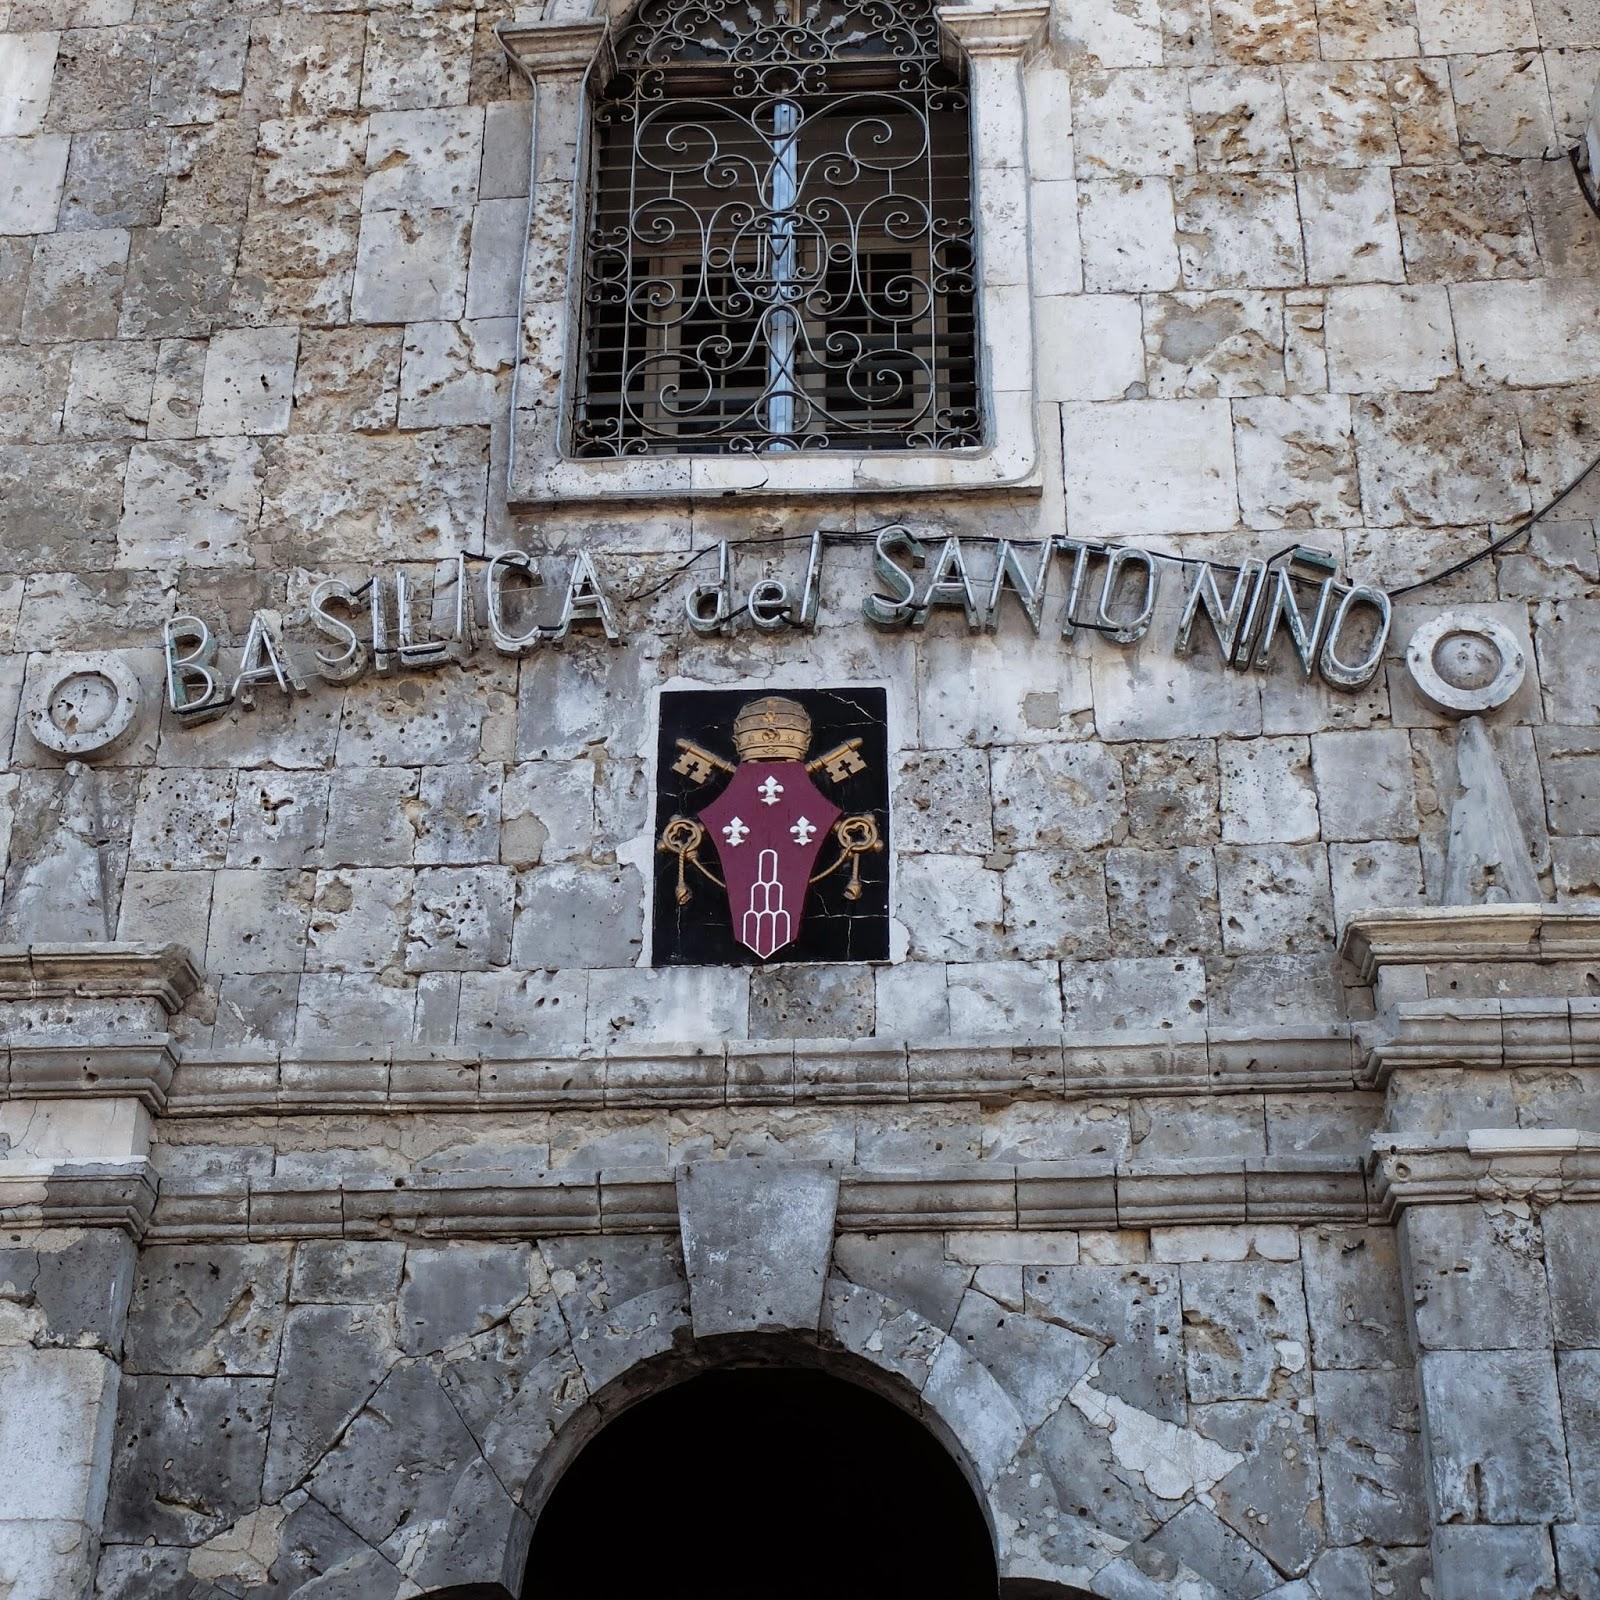 Cebu travel diary | Basilica del Santo Nino